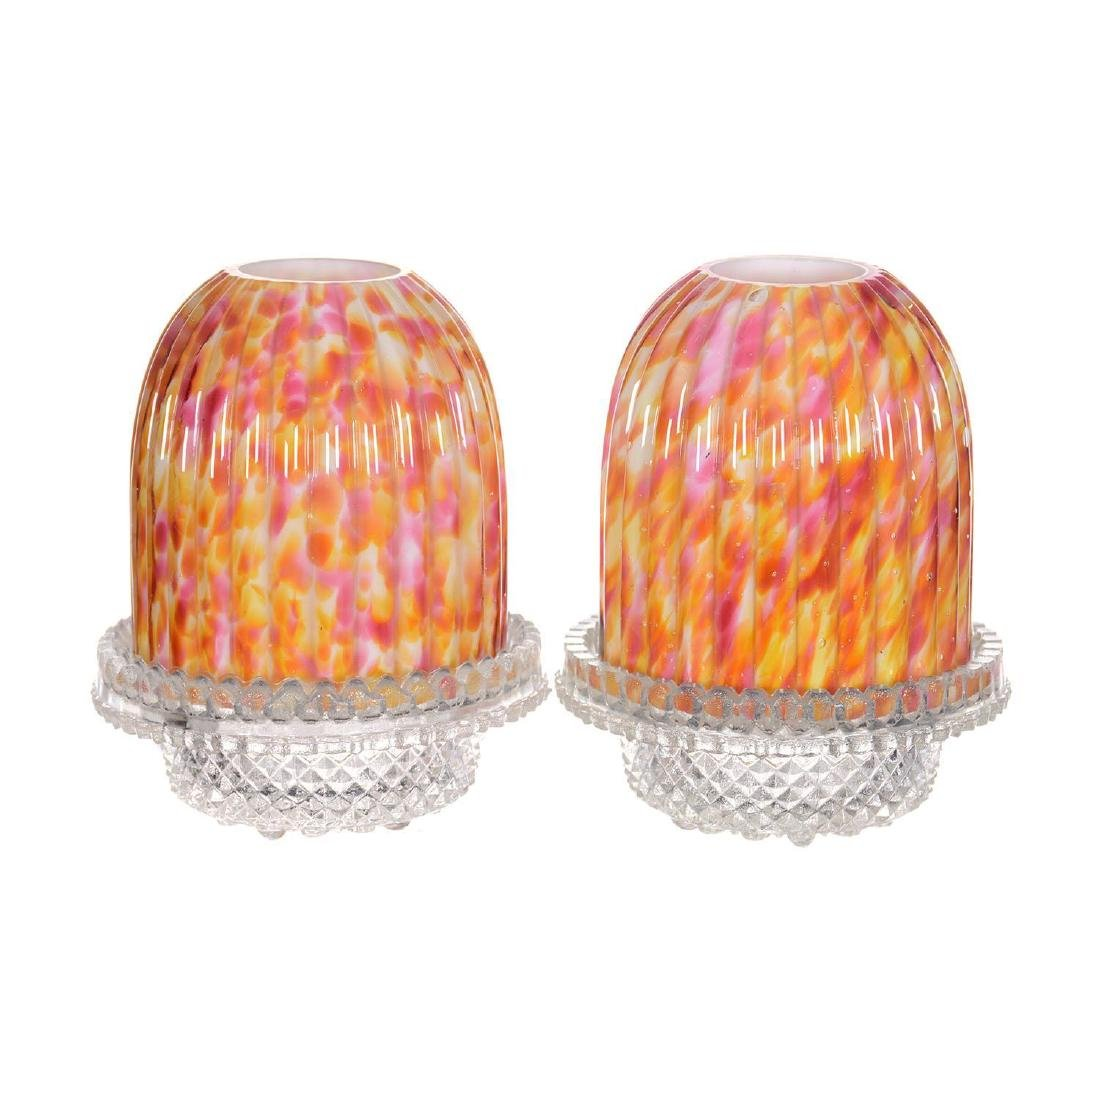 "Pair 5"" Art Glass Fairy Lamps"